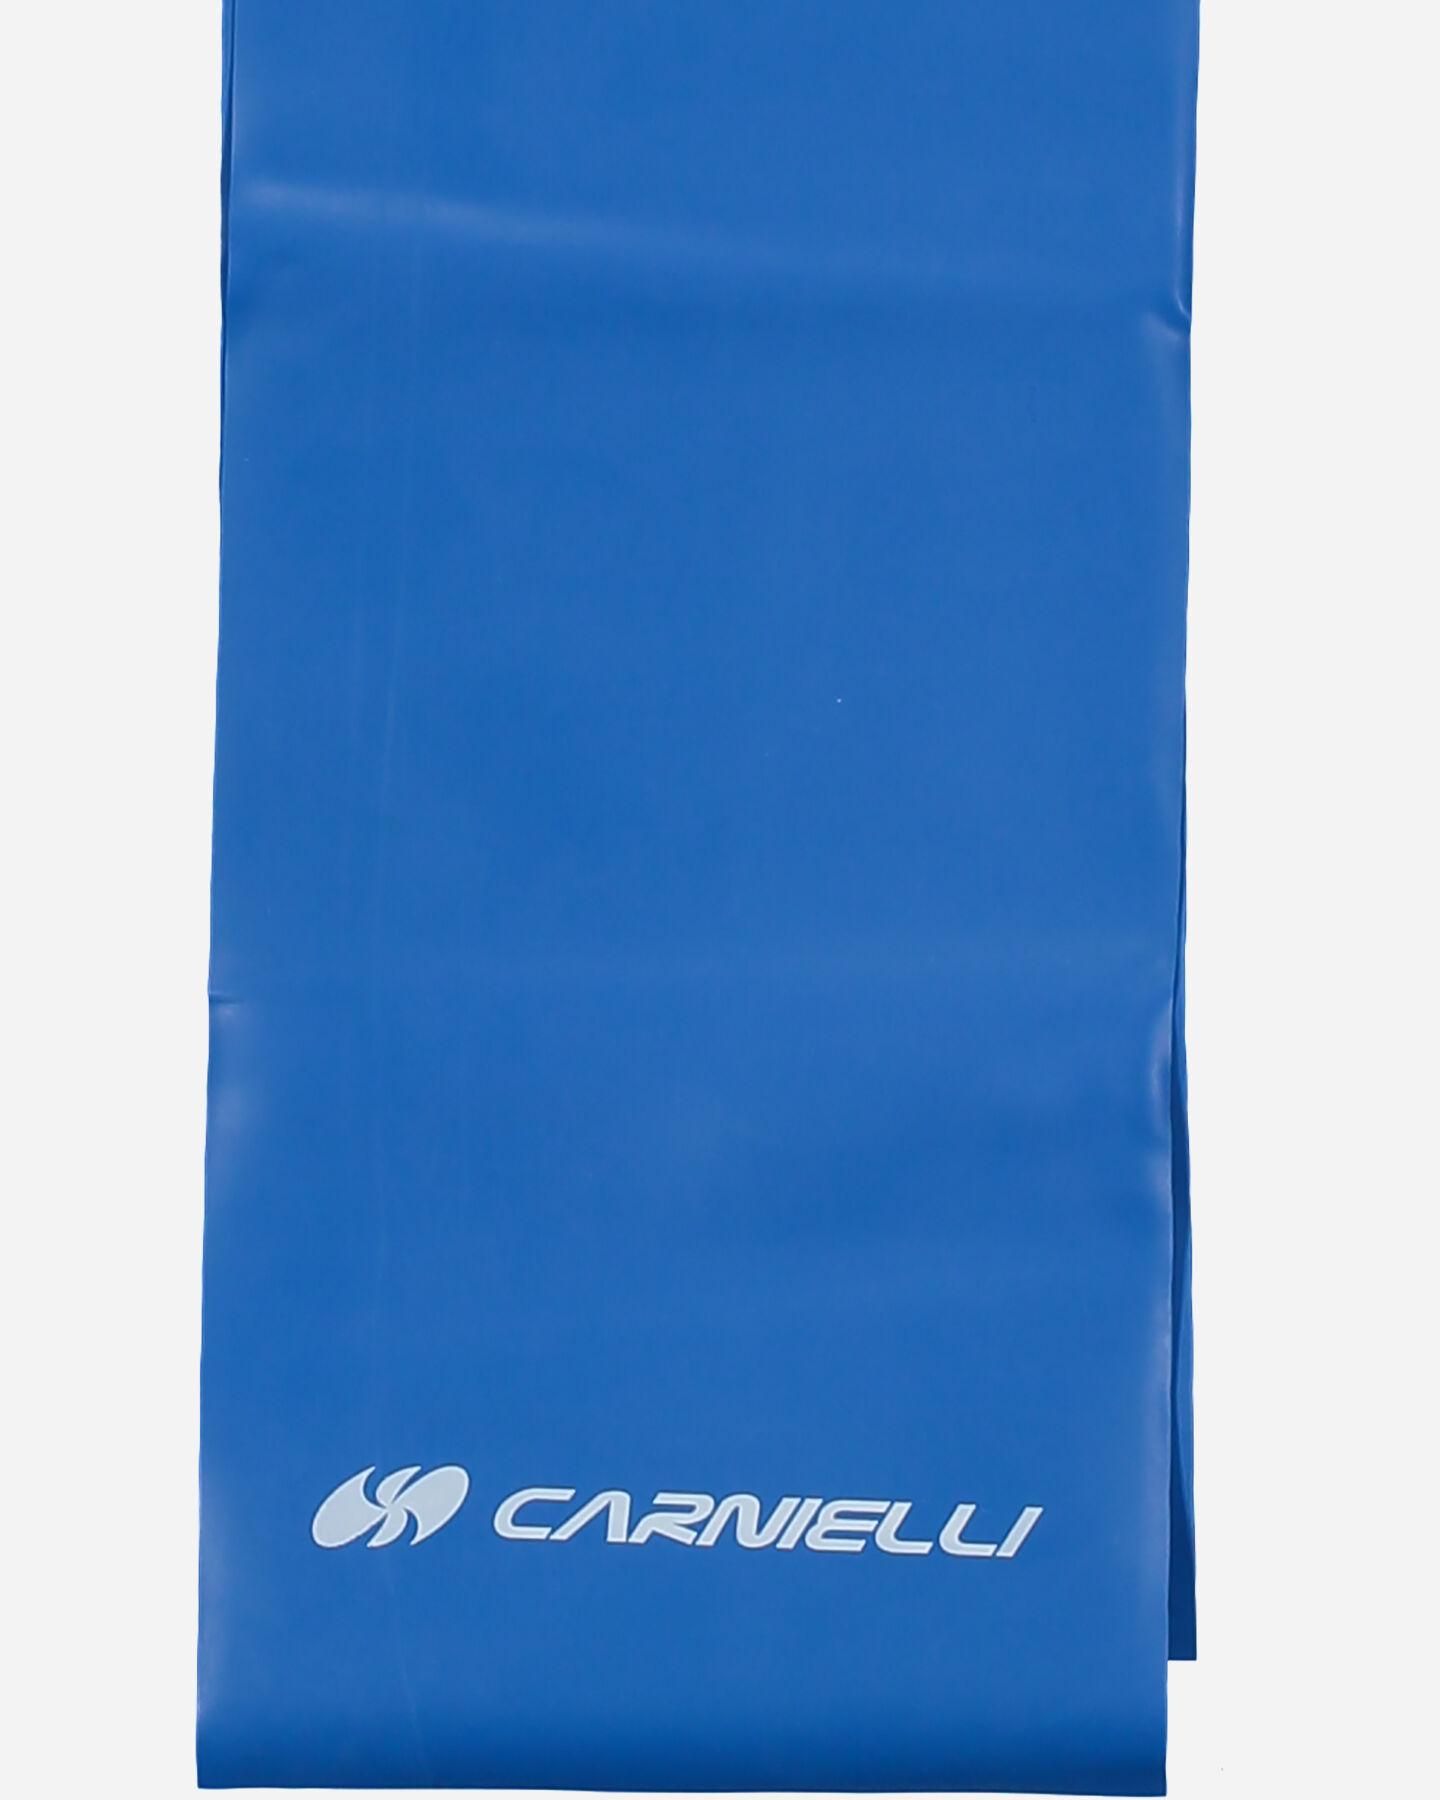 Banda elastica CARNIELLI BANDA ELASTICA 175 CM S1326888 1 UNI scatto 1